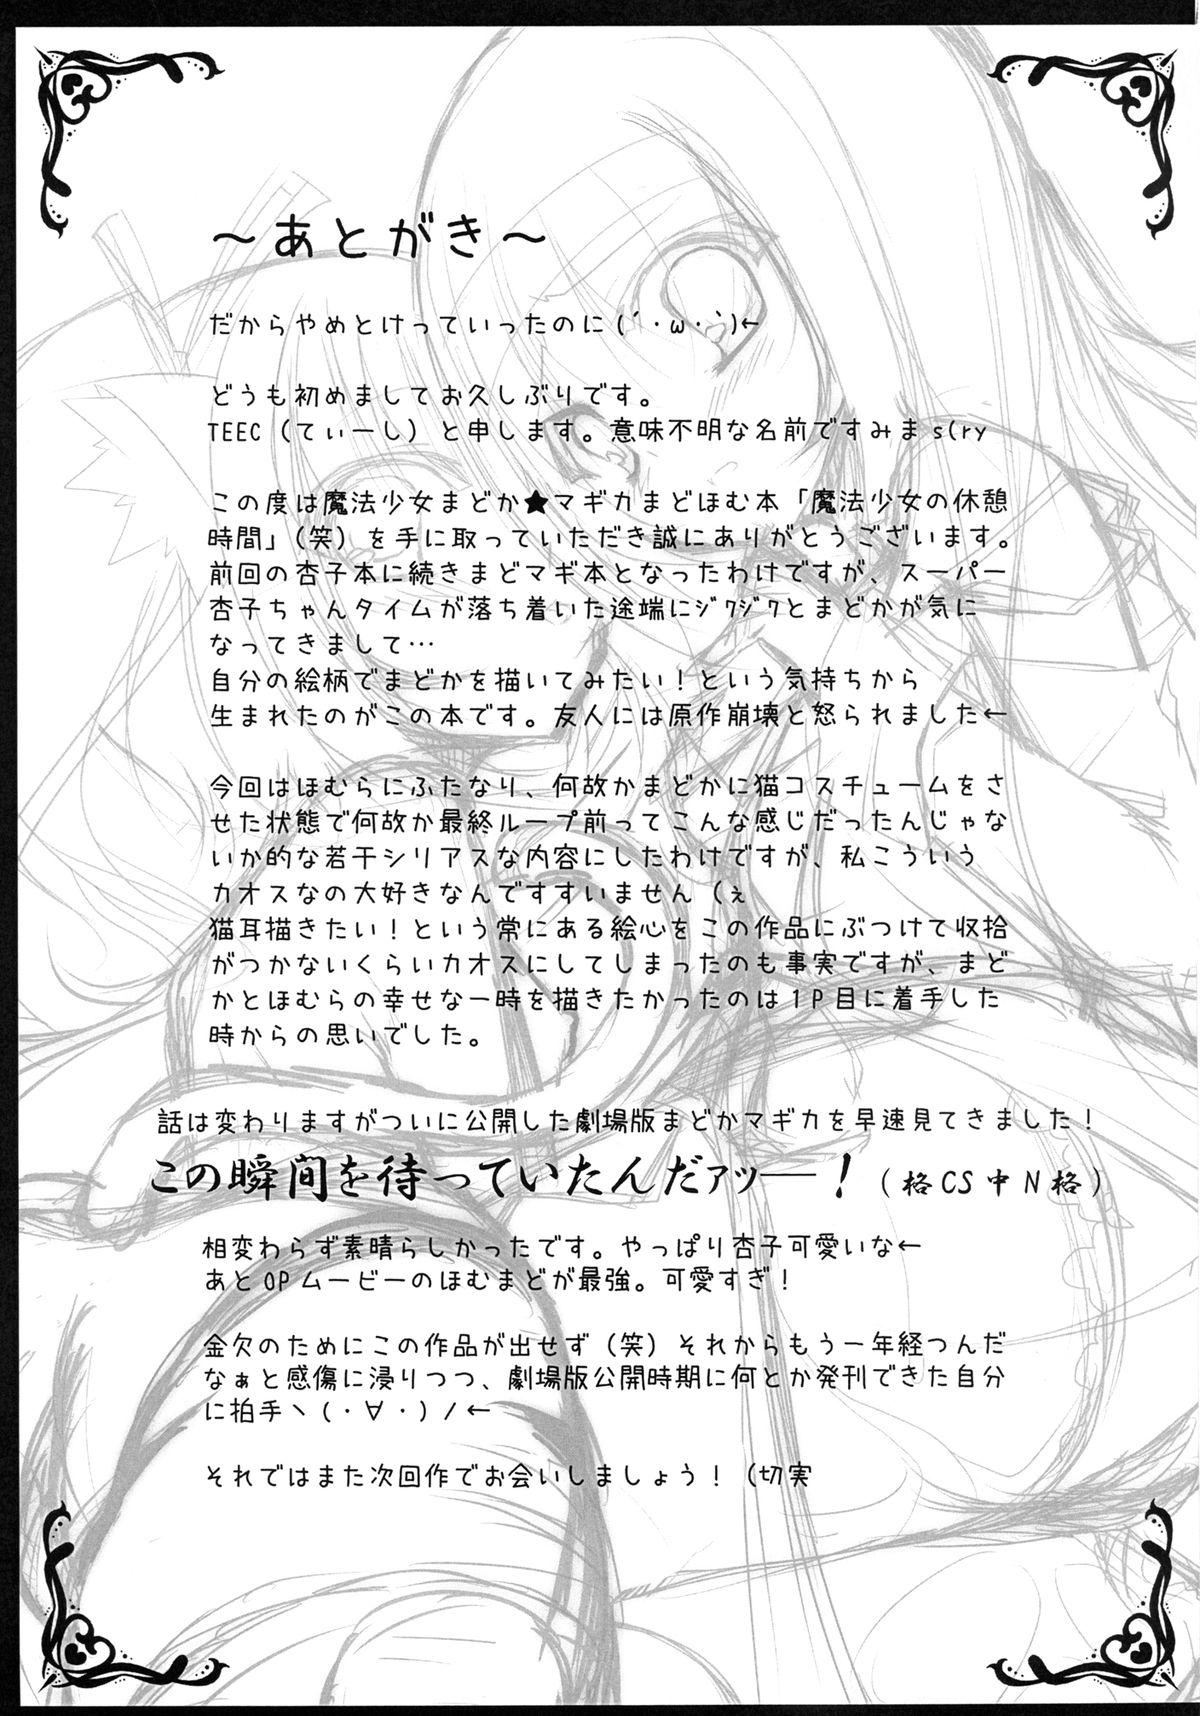 Mahou Shoujo no Time Stop 14